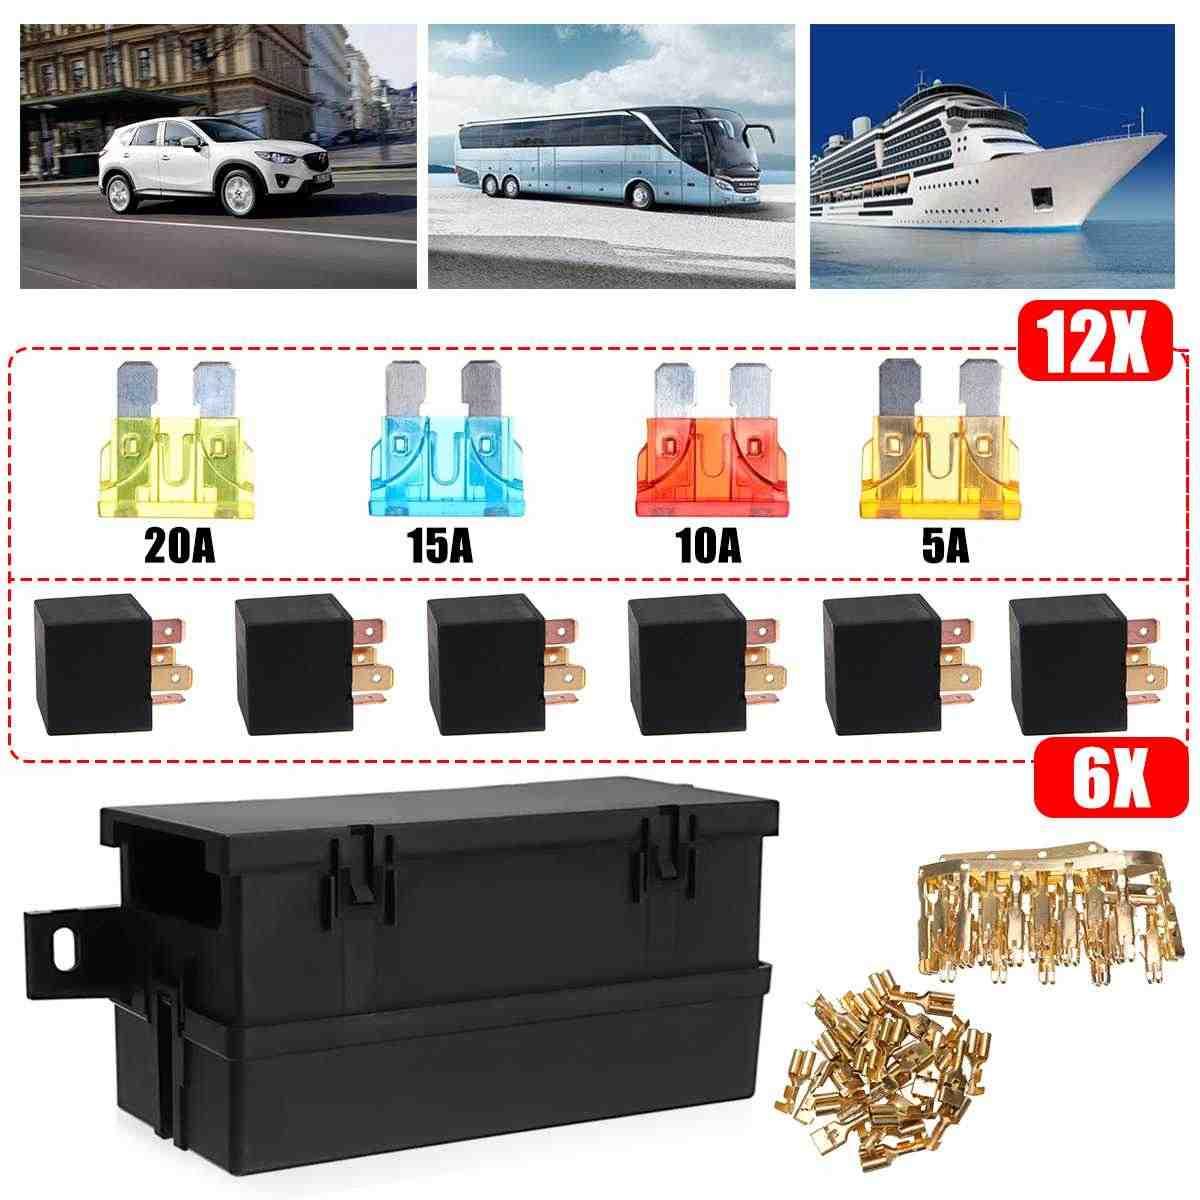 universal for cars automot auto car part 6 way 6 relays w relay box [ 1200 x 1200 Pixel ]